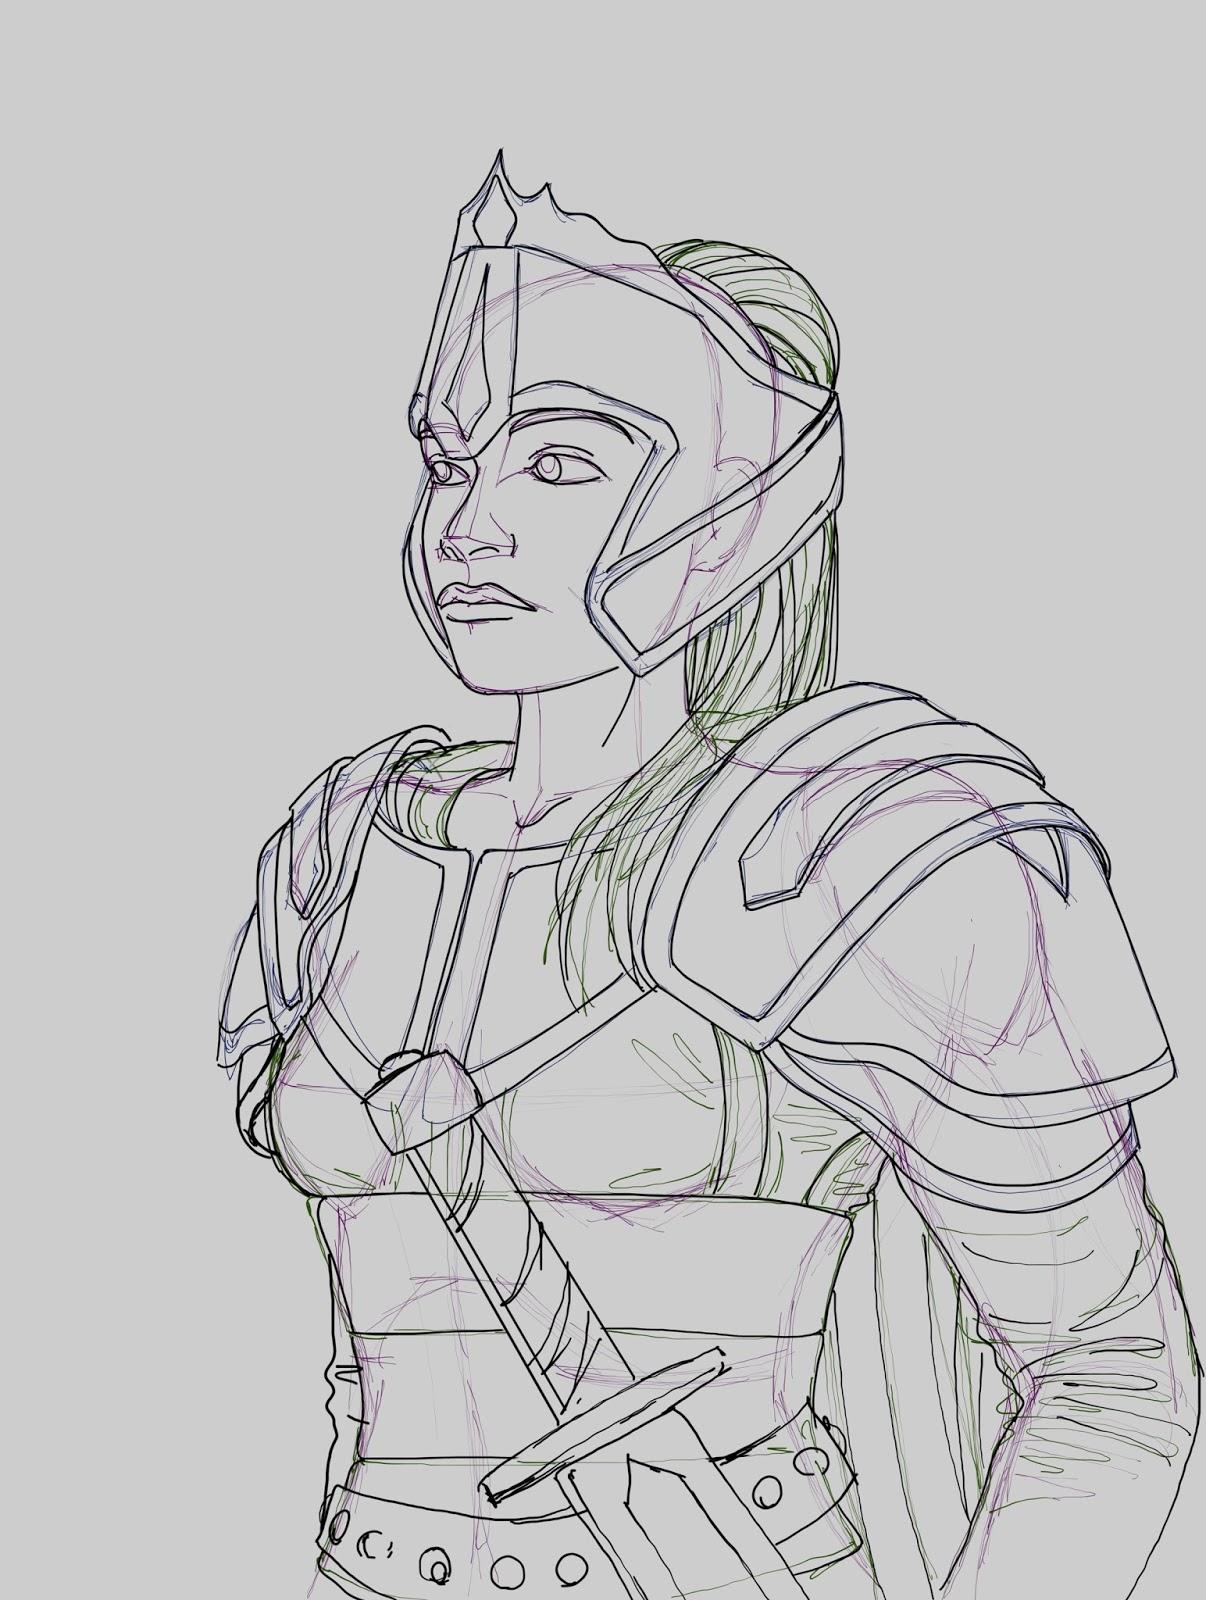 Warrior - Rough Sketch